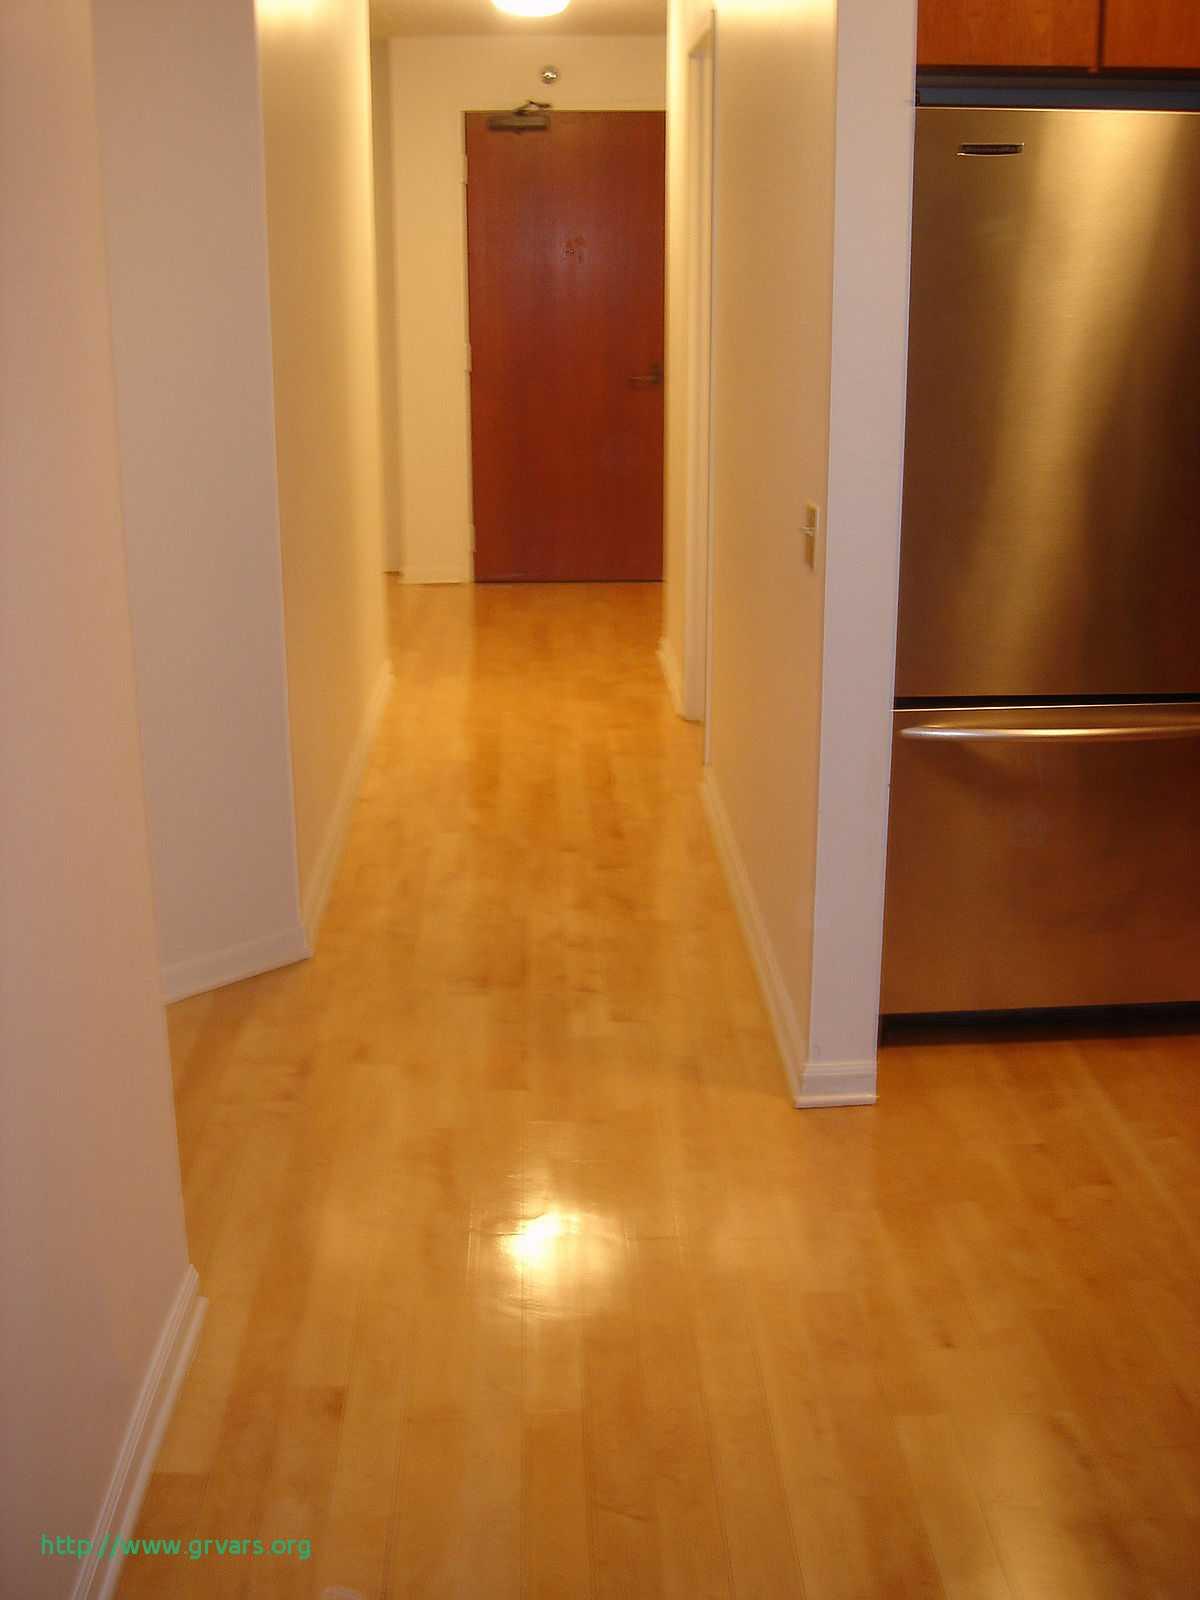 unfinished hardwood floor filler of 21 beau cheapest hardwood flooring in toronto ideas blog pertaining to cheapest hardwood flooring in toronto beau fabulous discount hardwood flooring 0 floor brampton 25 toronto